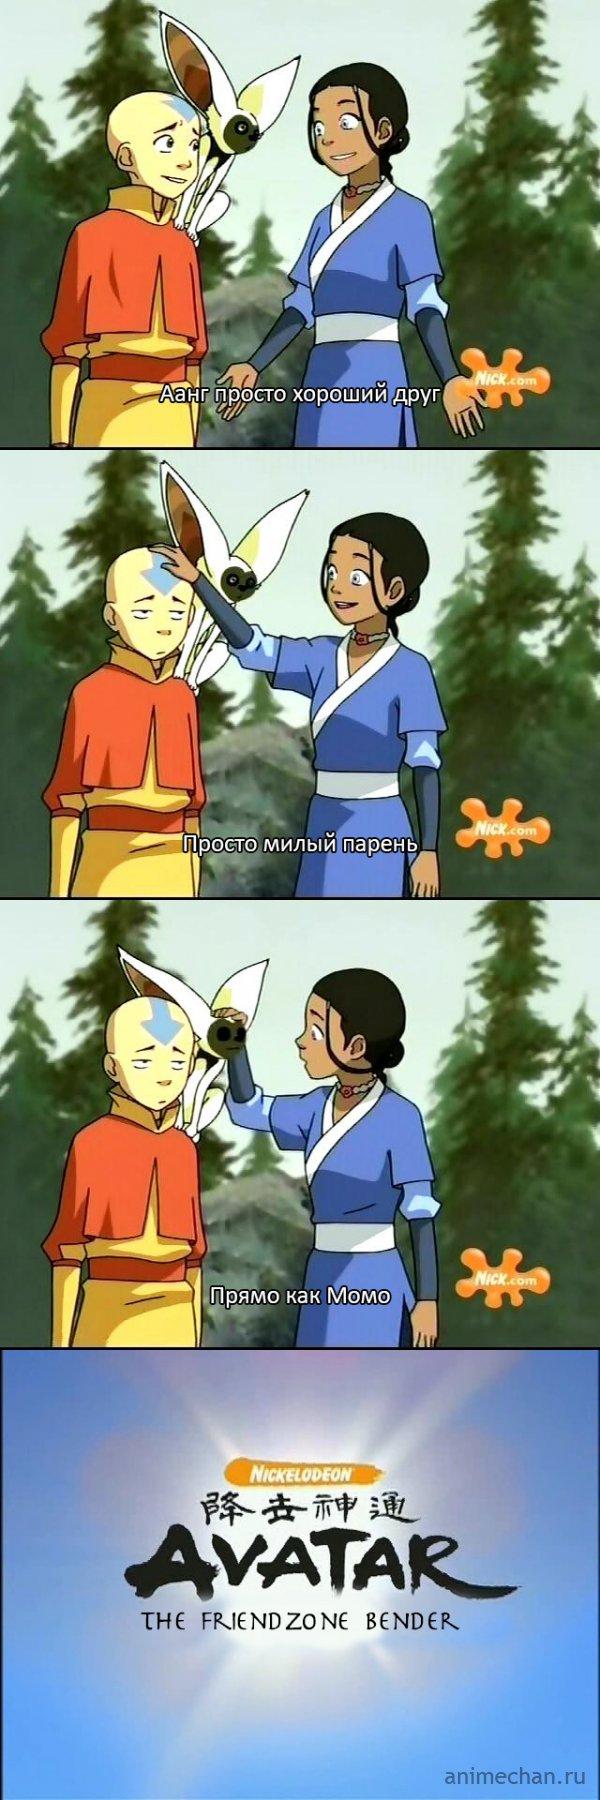 Avatar: The Friendzone Bender